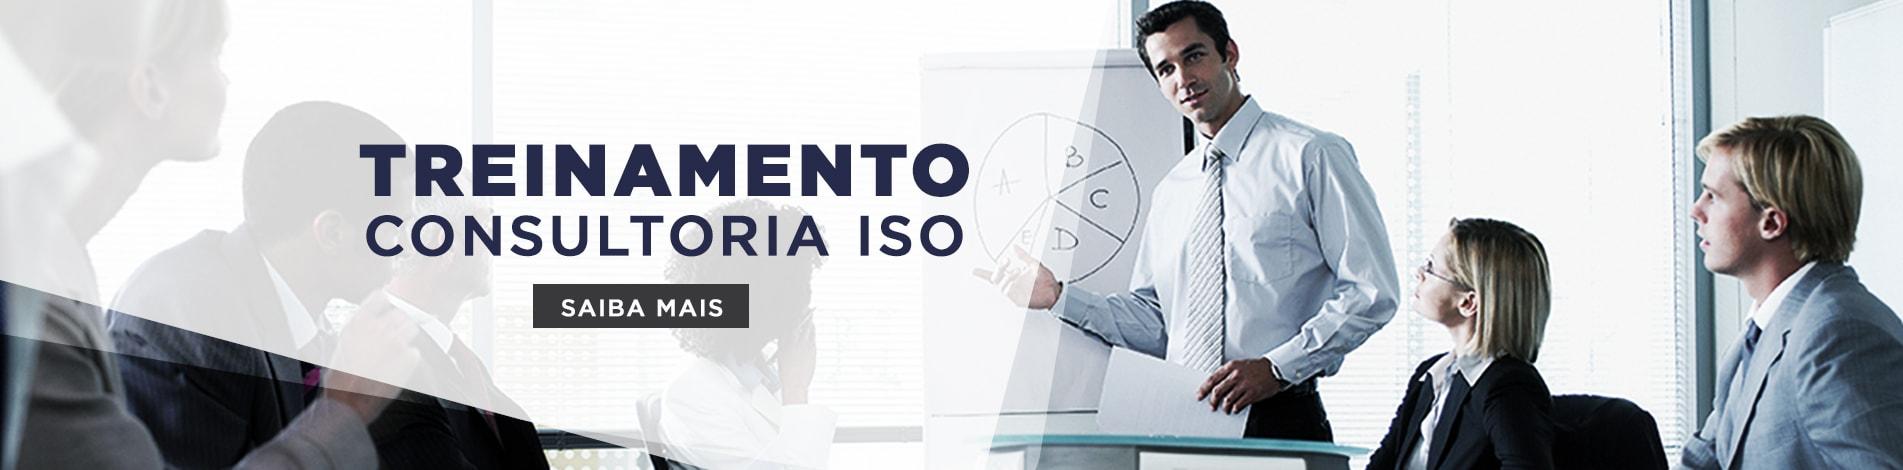 Treinamento Consultoria ISO